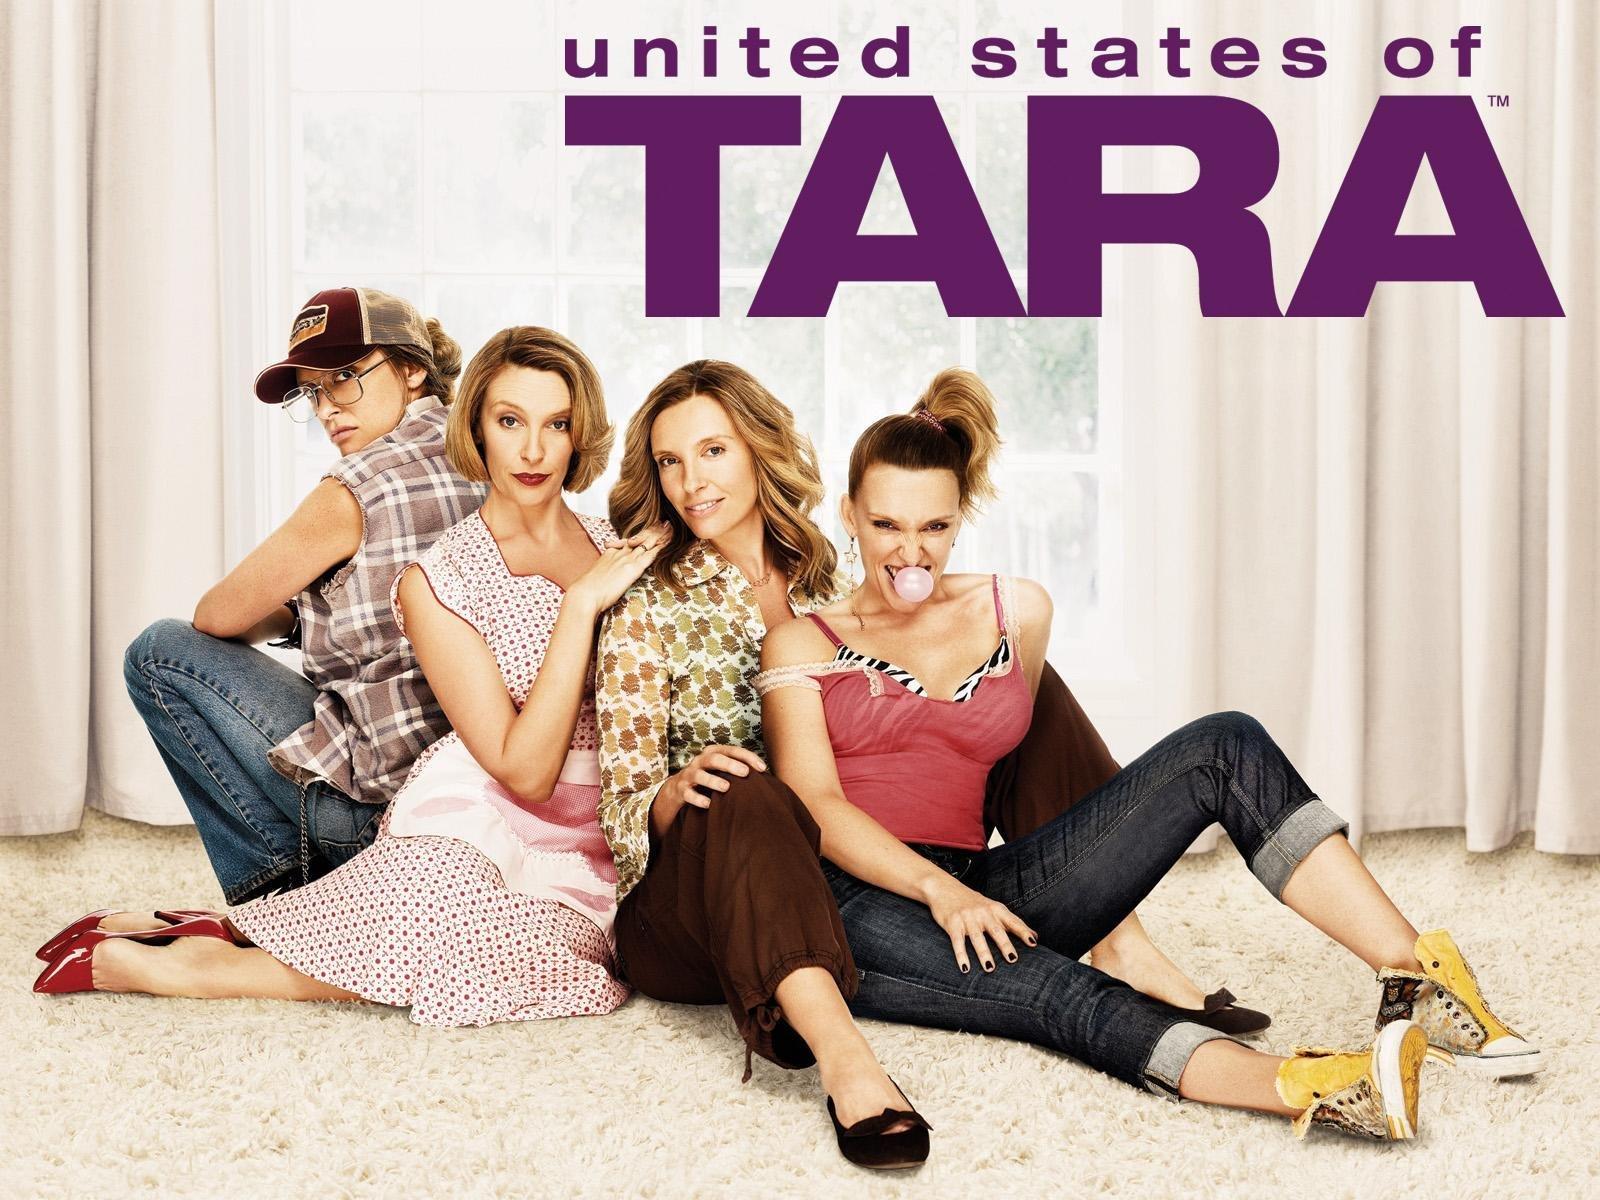 united states of tara episodes online free